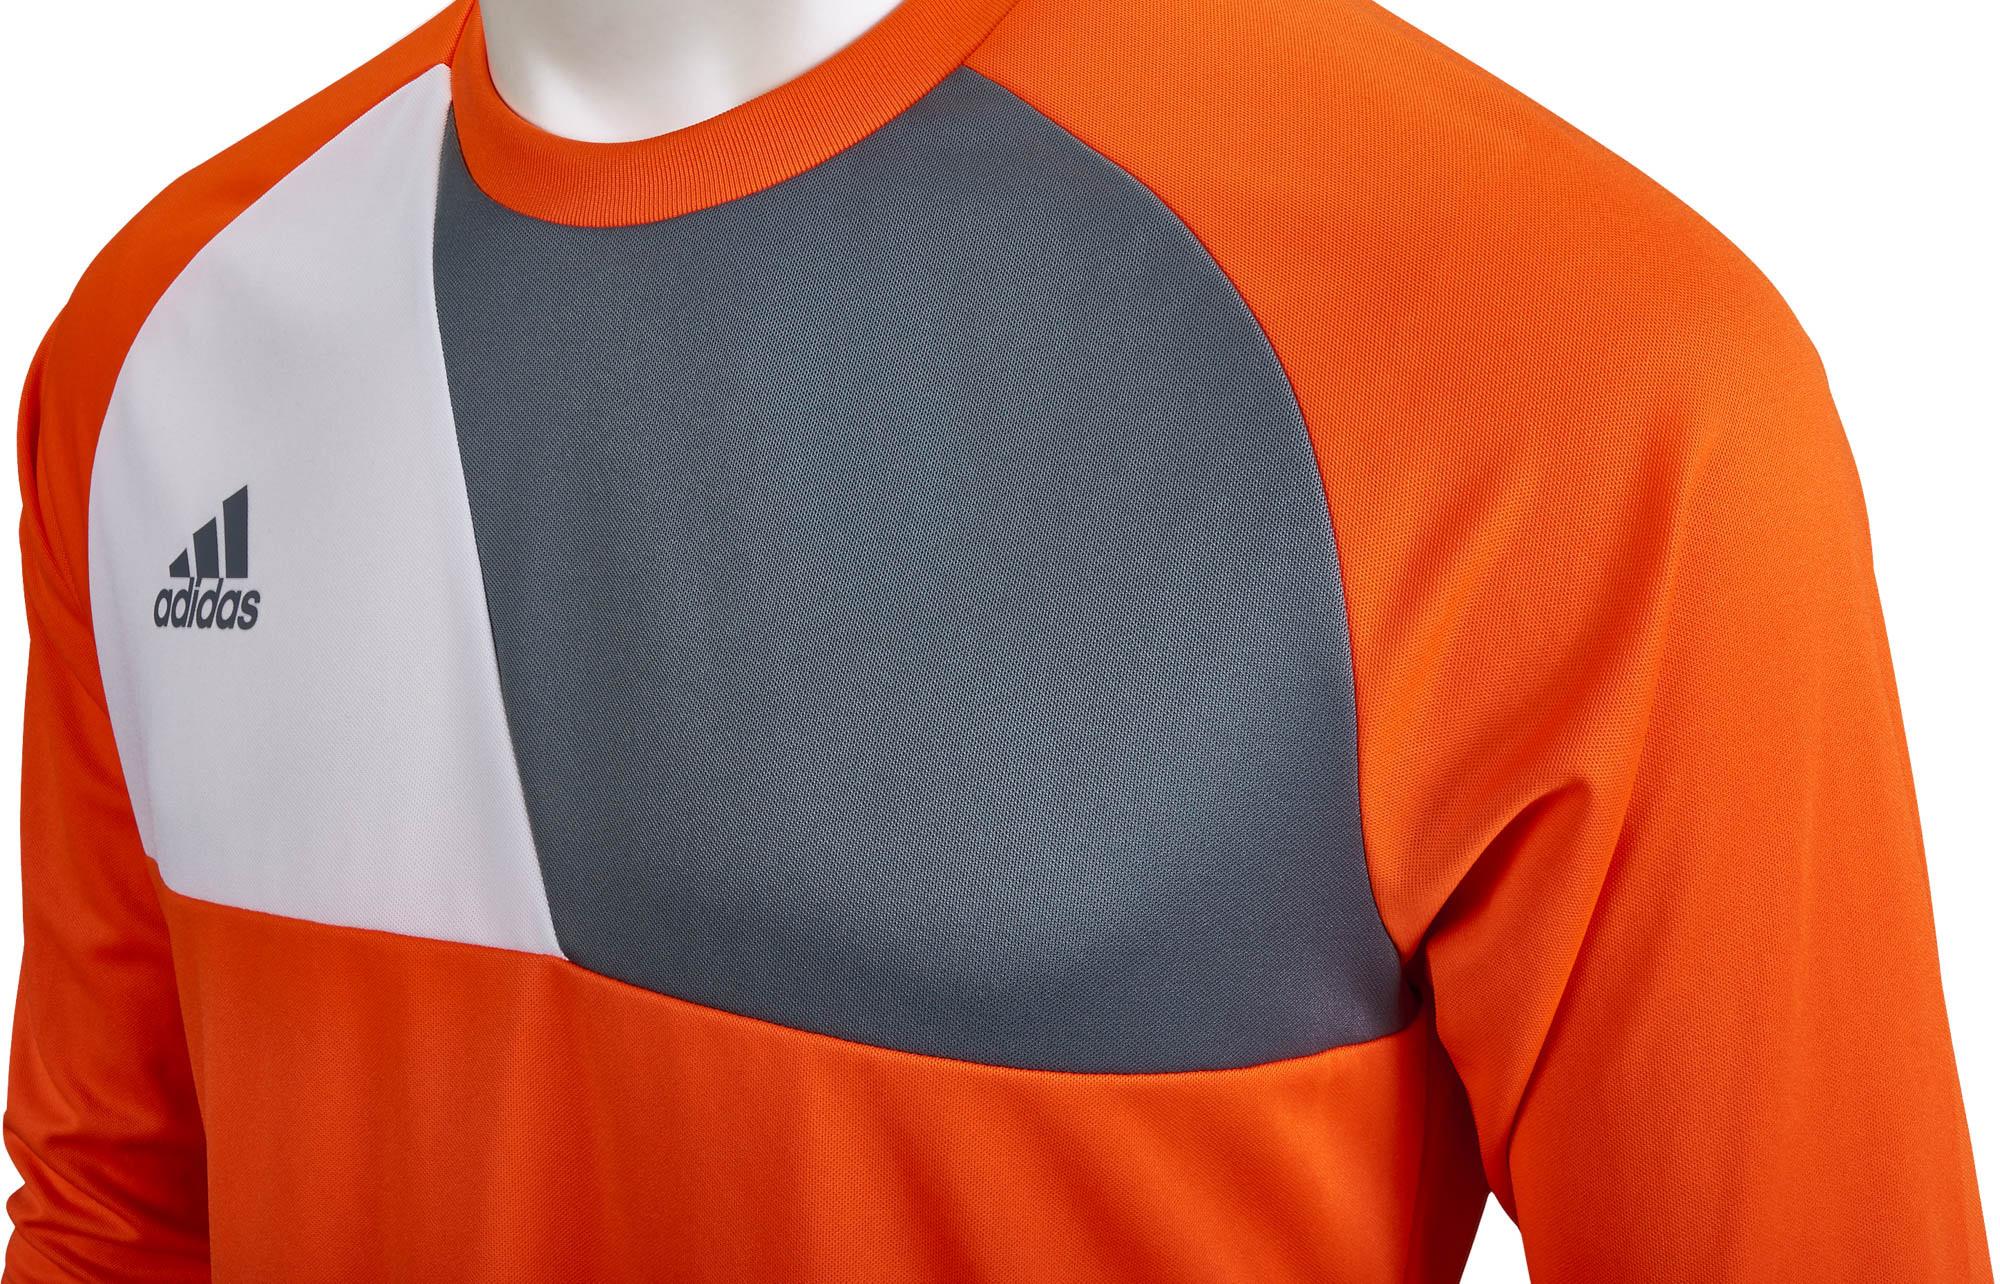 adidas Assita 17 Goalkeeper Jersey - Orange & White